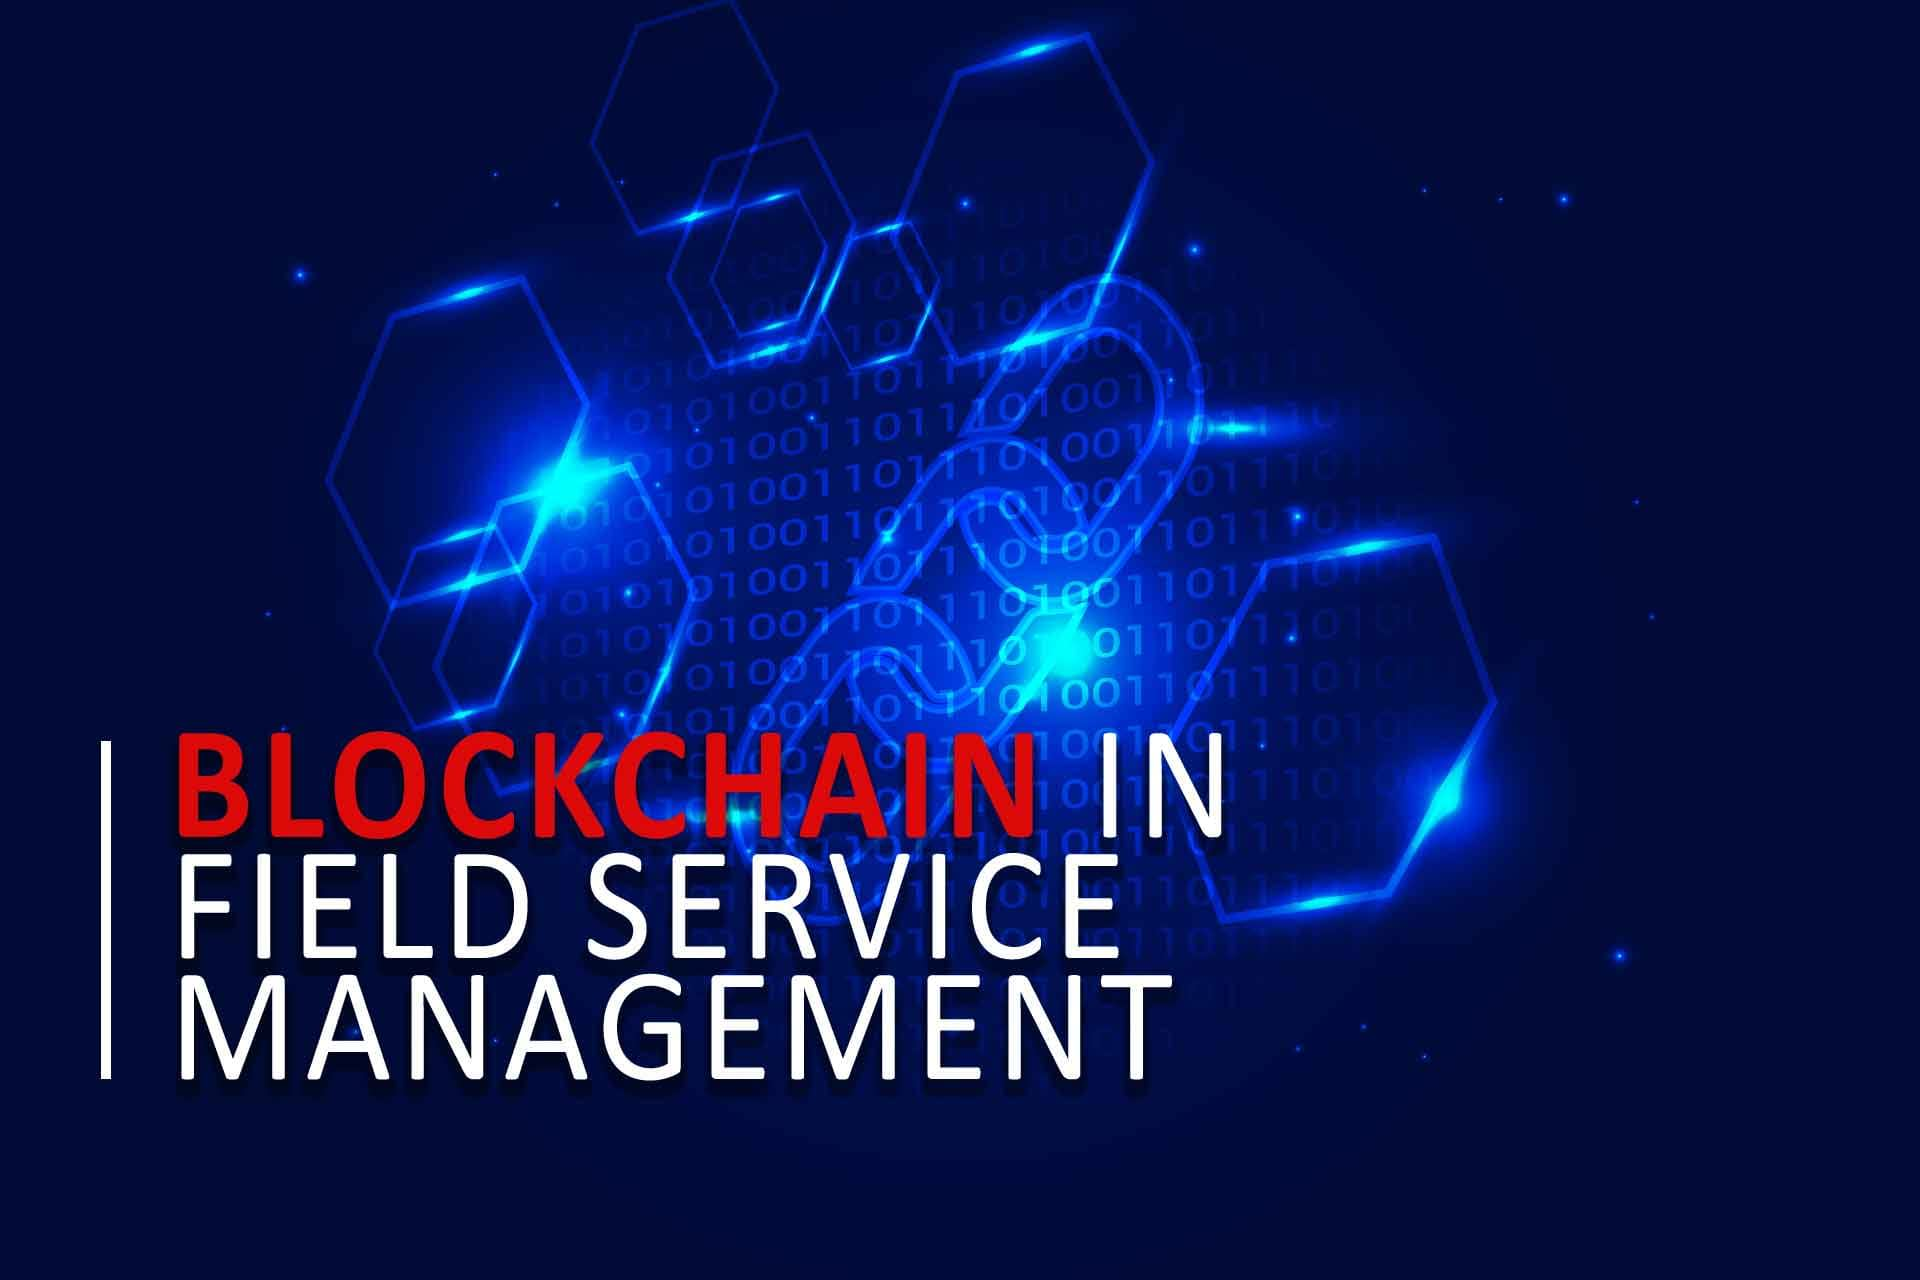 block chain in field service management